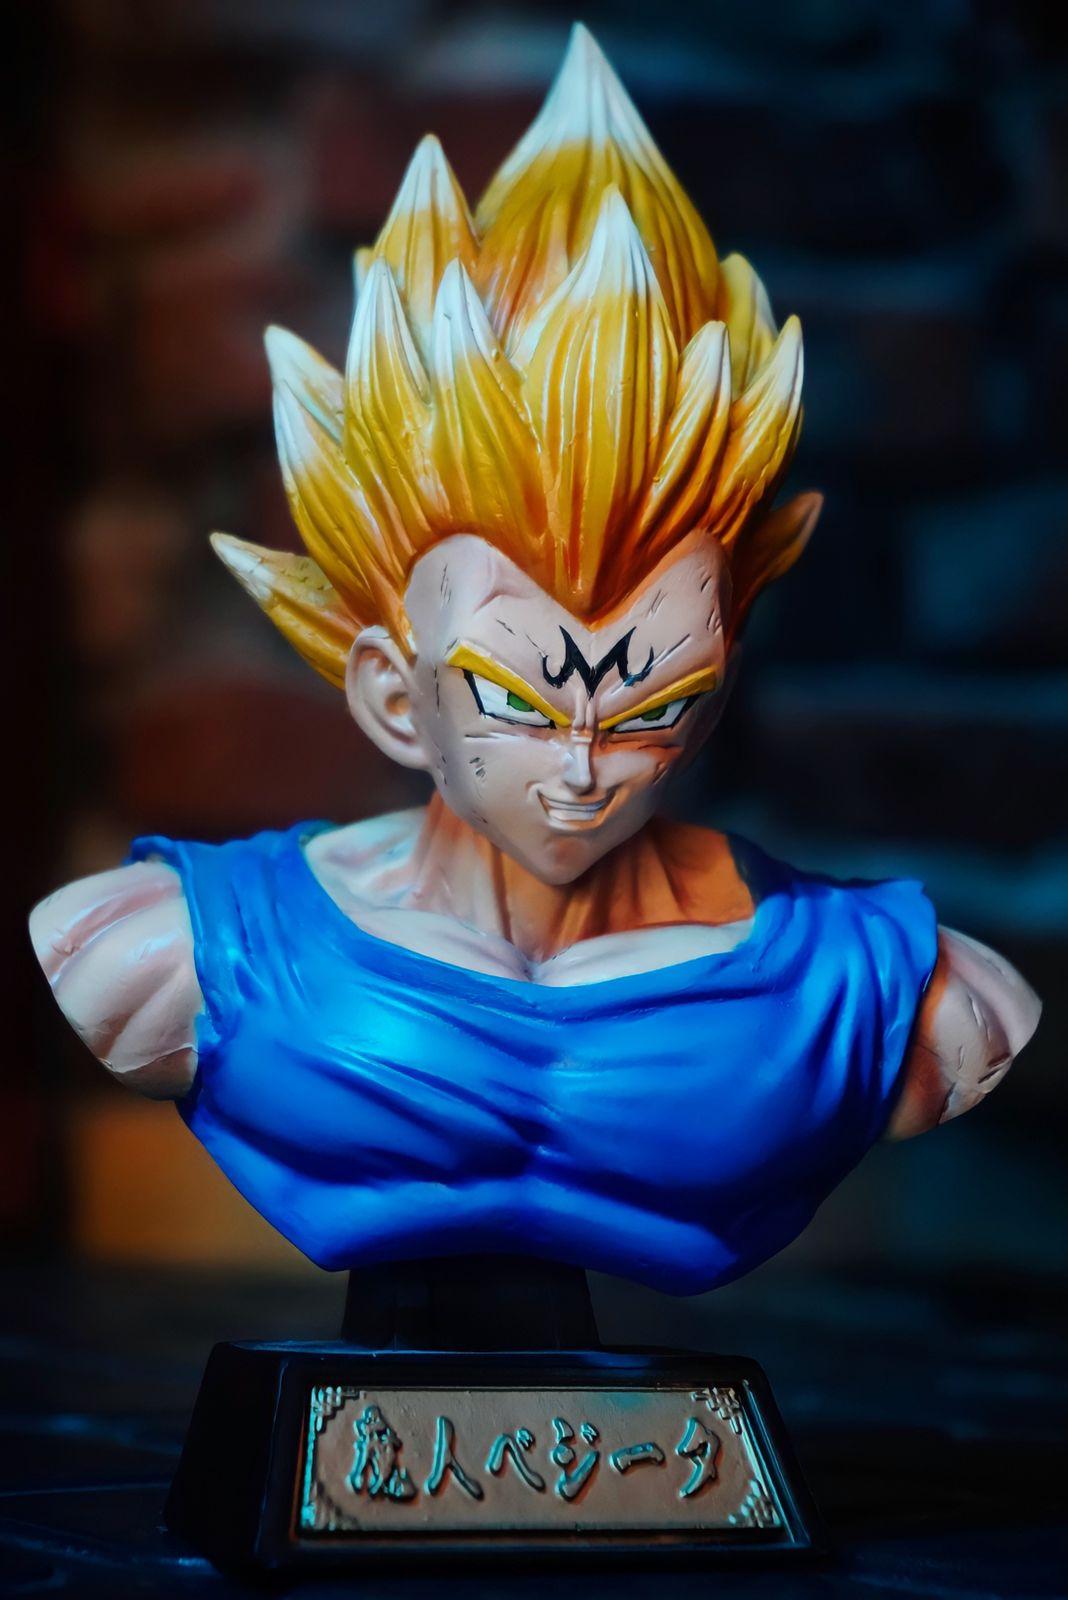 Estátua Busto Vegeta Super Saiyajin: Dragon Ball Z Anime Mangá - EV